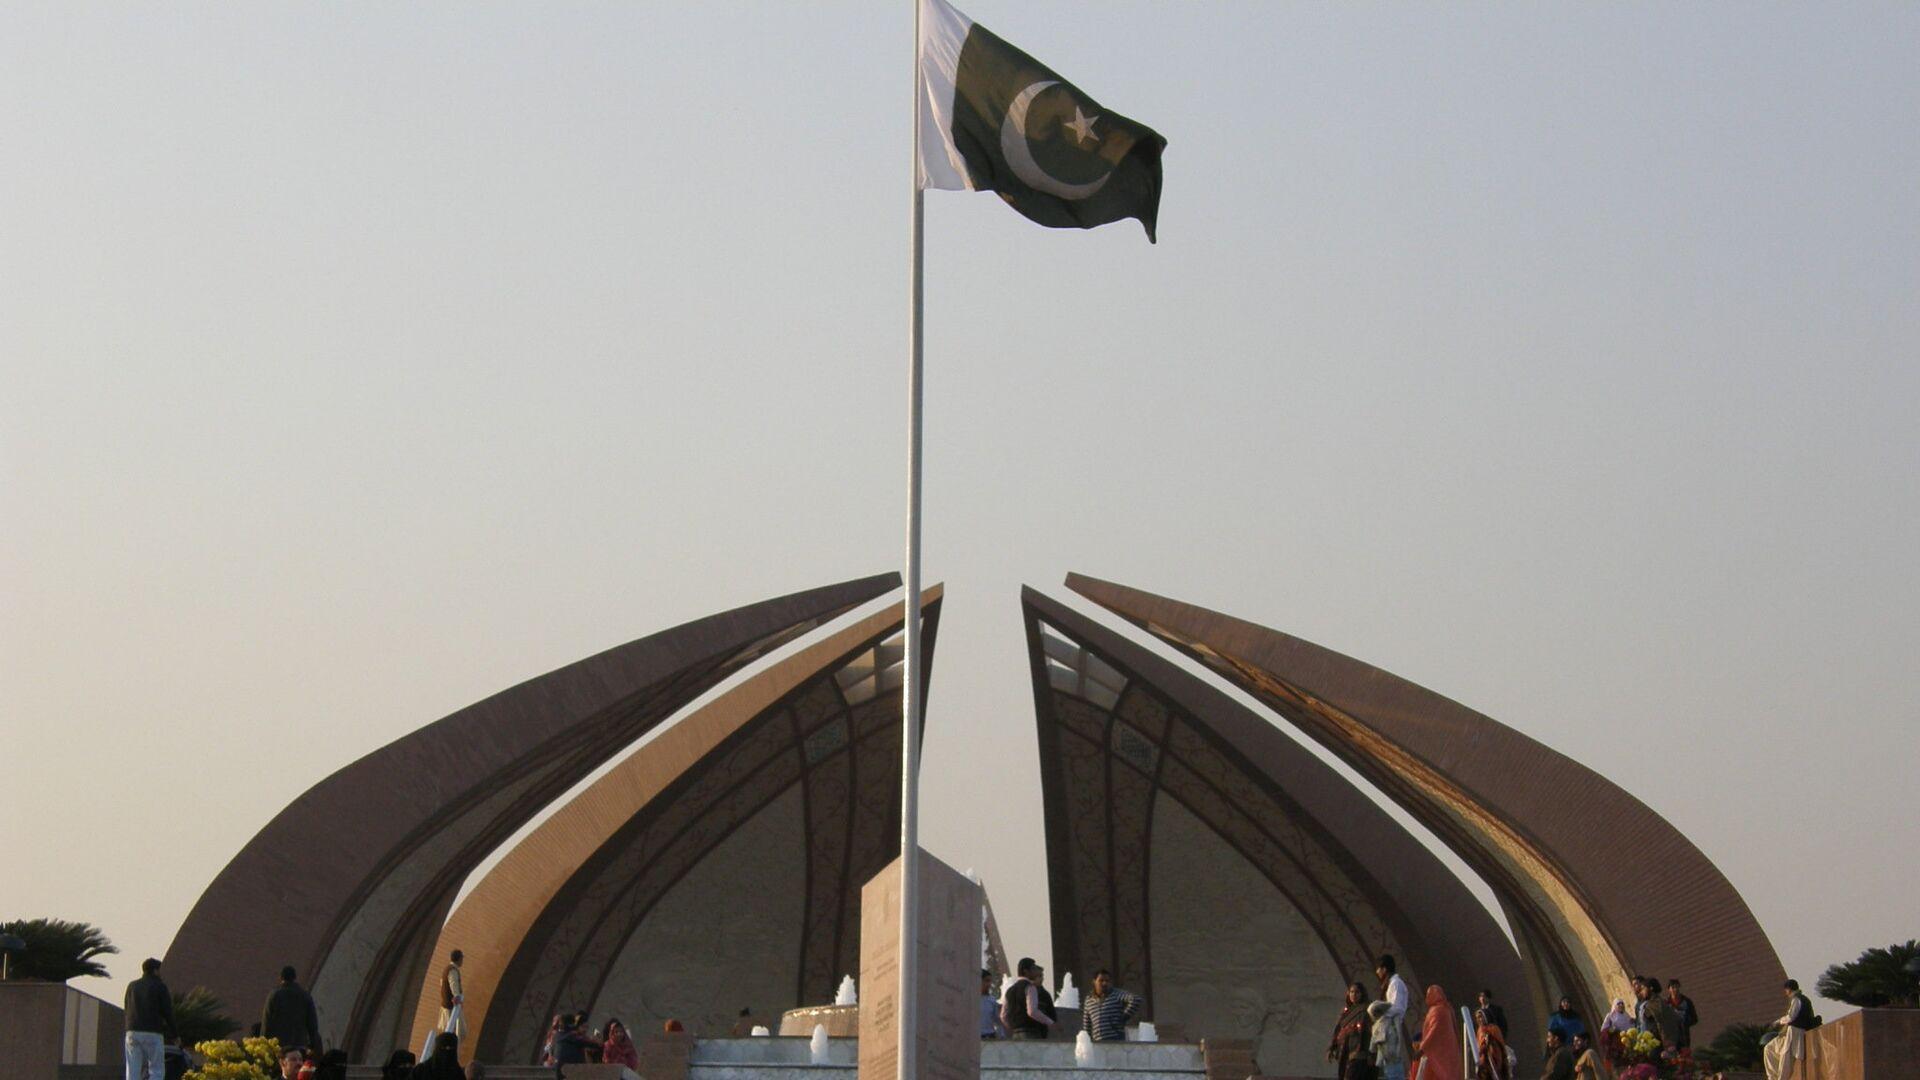 Bandera de Pakistán en Islamabad - Sputnik Mundo, 1920, 29.03.2021